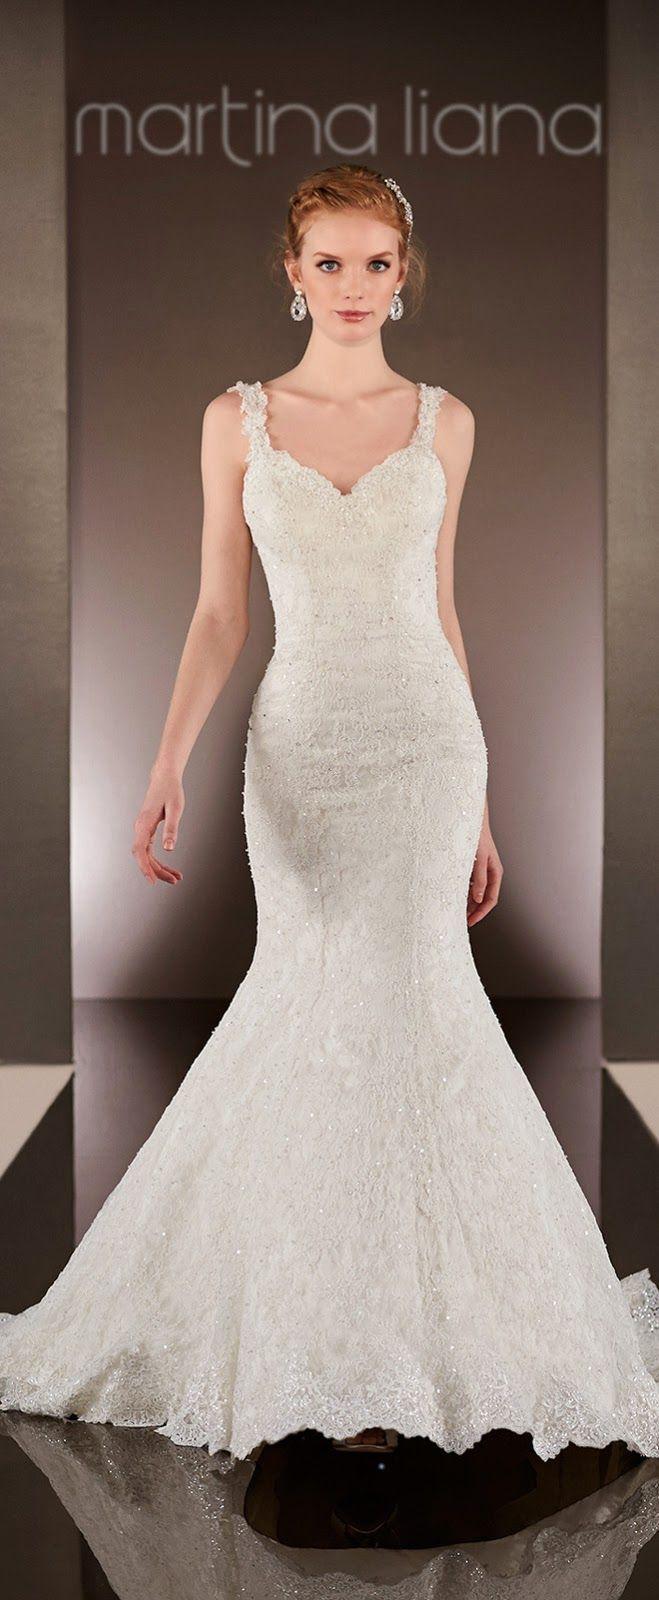 Best 25 spring wedding guest dresses ideas on pinterest for White dresses for wedding guests